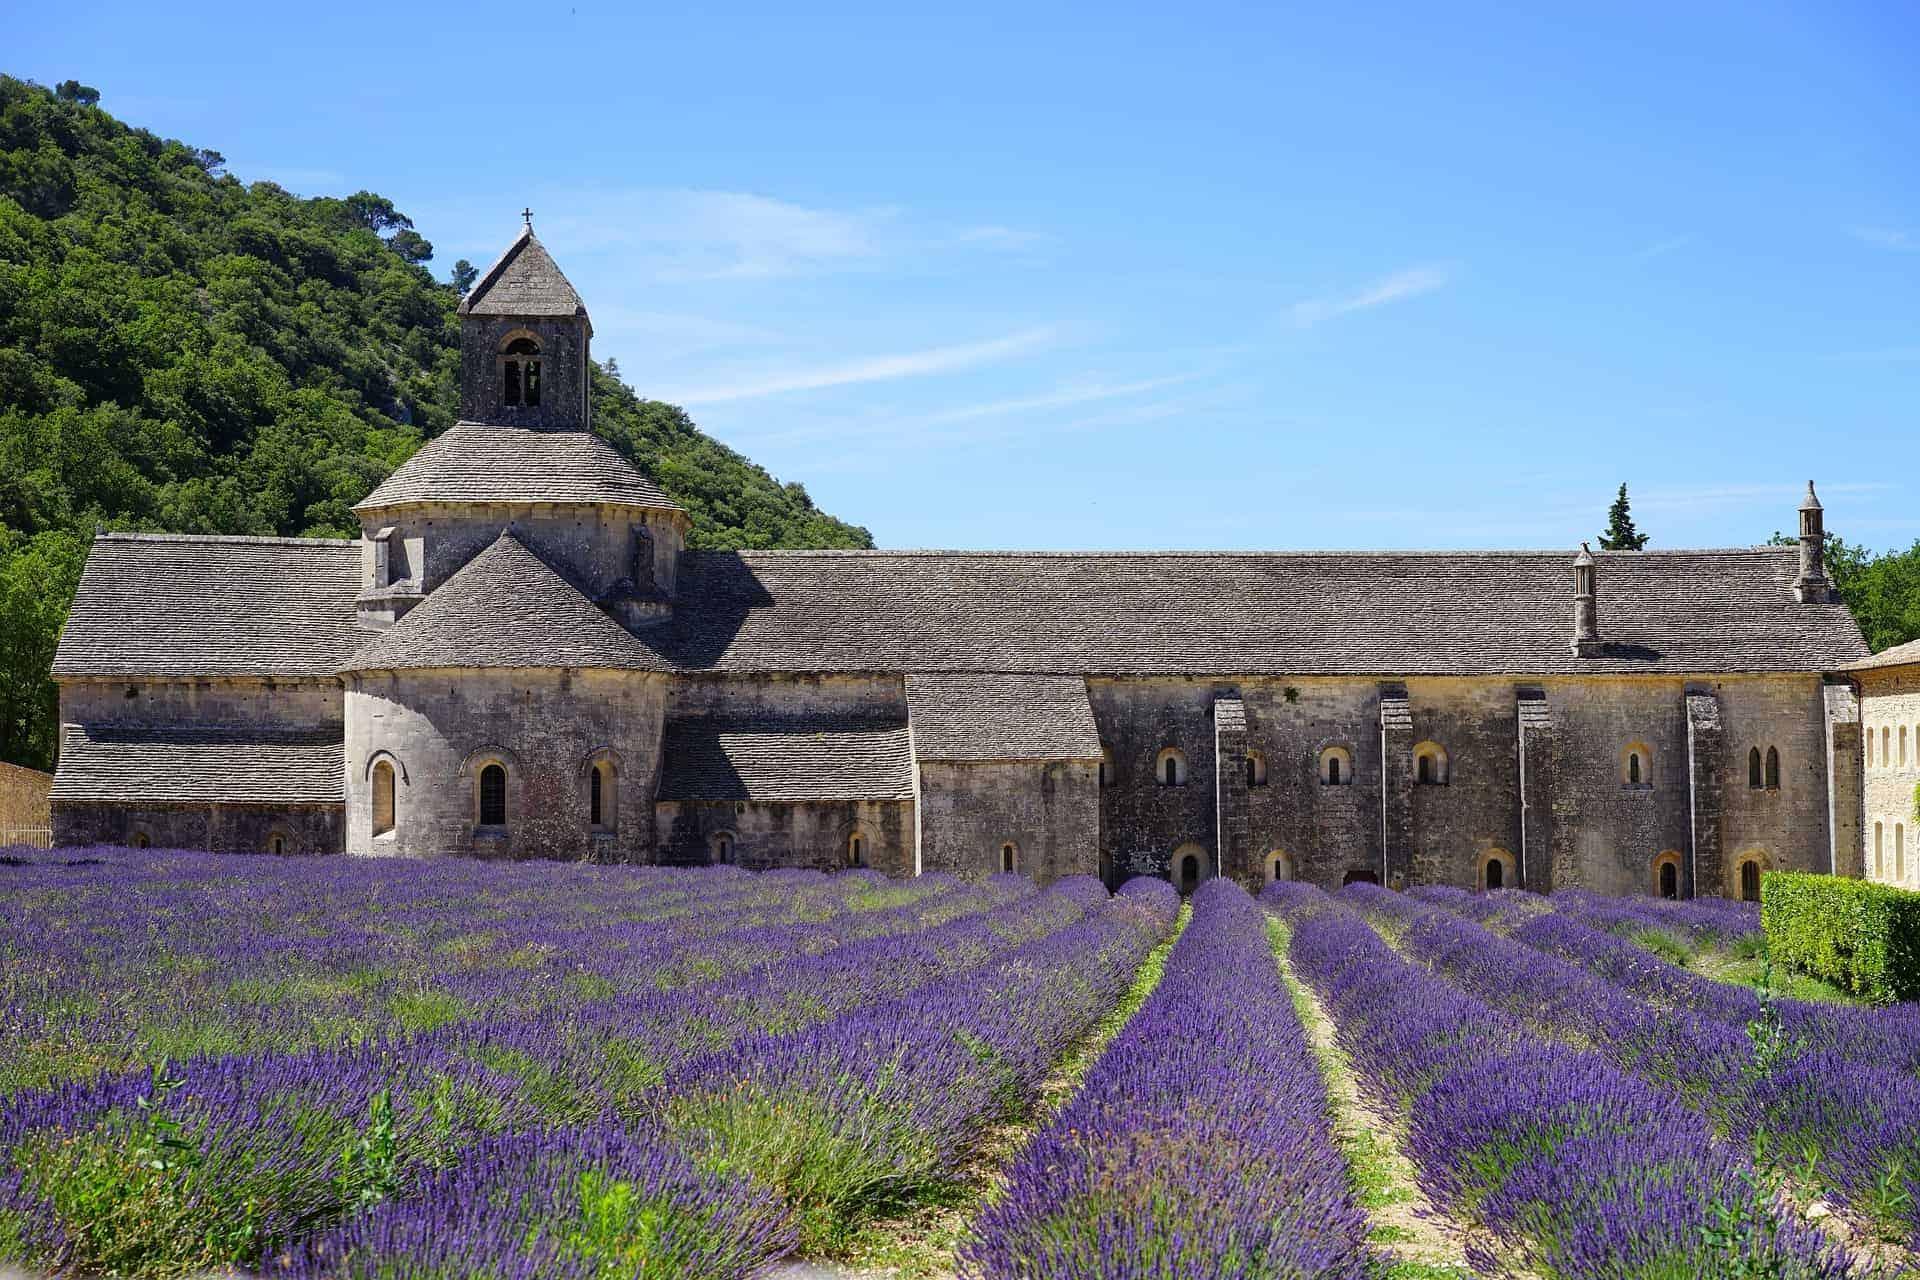 Munkekloster - Abbaye De Senanque i Provence, Lavendel marked i Provence, Lavendel i Provence, Aix-en-Provence, romantisk tur til Provence, ting å gjøre i Provence, langhelg i Provence, weekendtur til Provence, ferie i Provence, ting å gjøre i Provence, lavendel i Provence